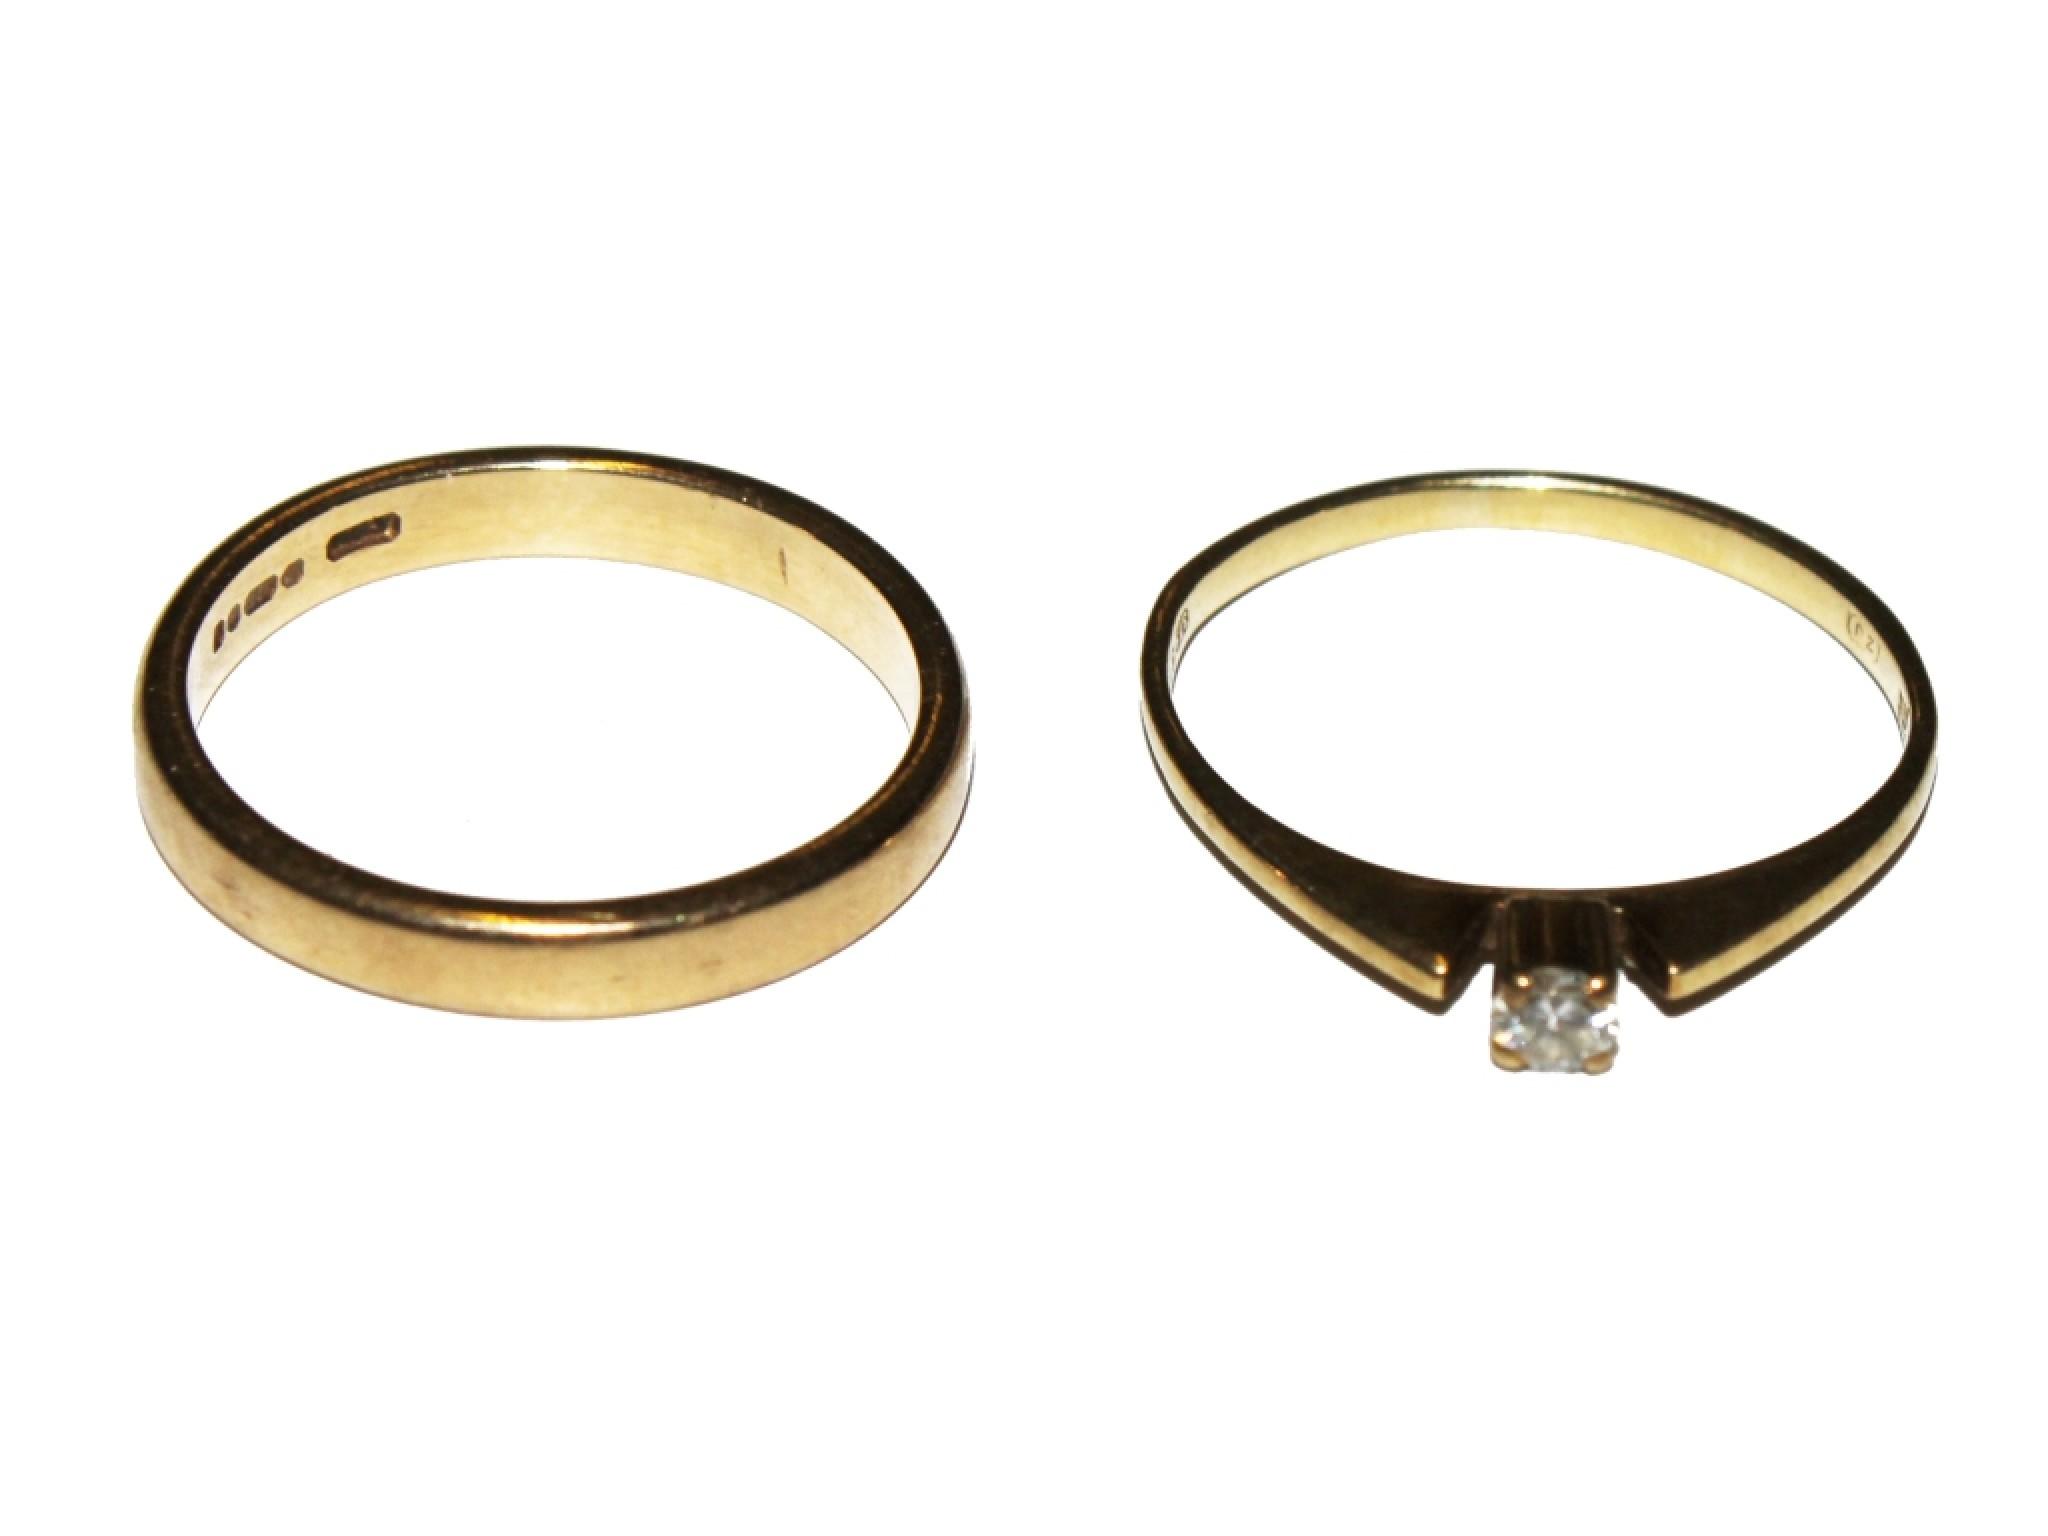 A diamond single stone ring, plus a 9 carat wedding ring